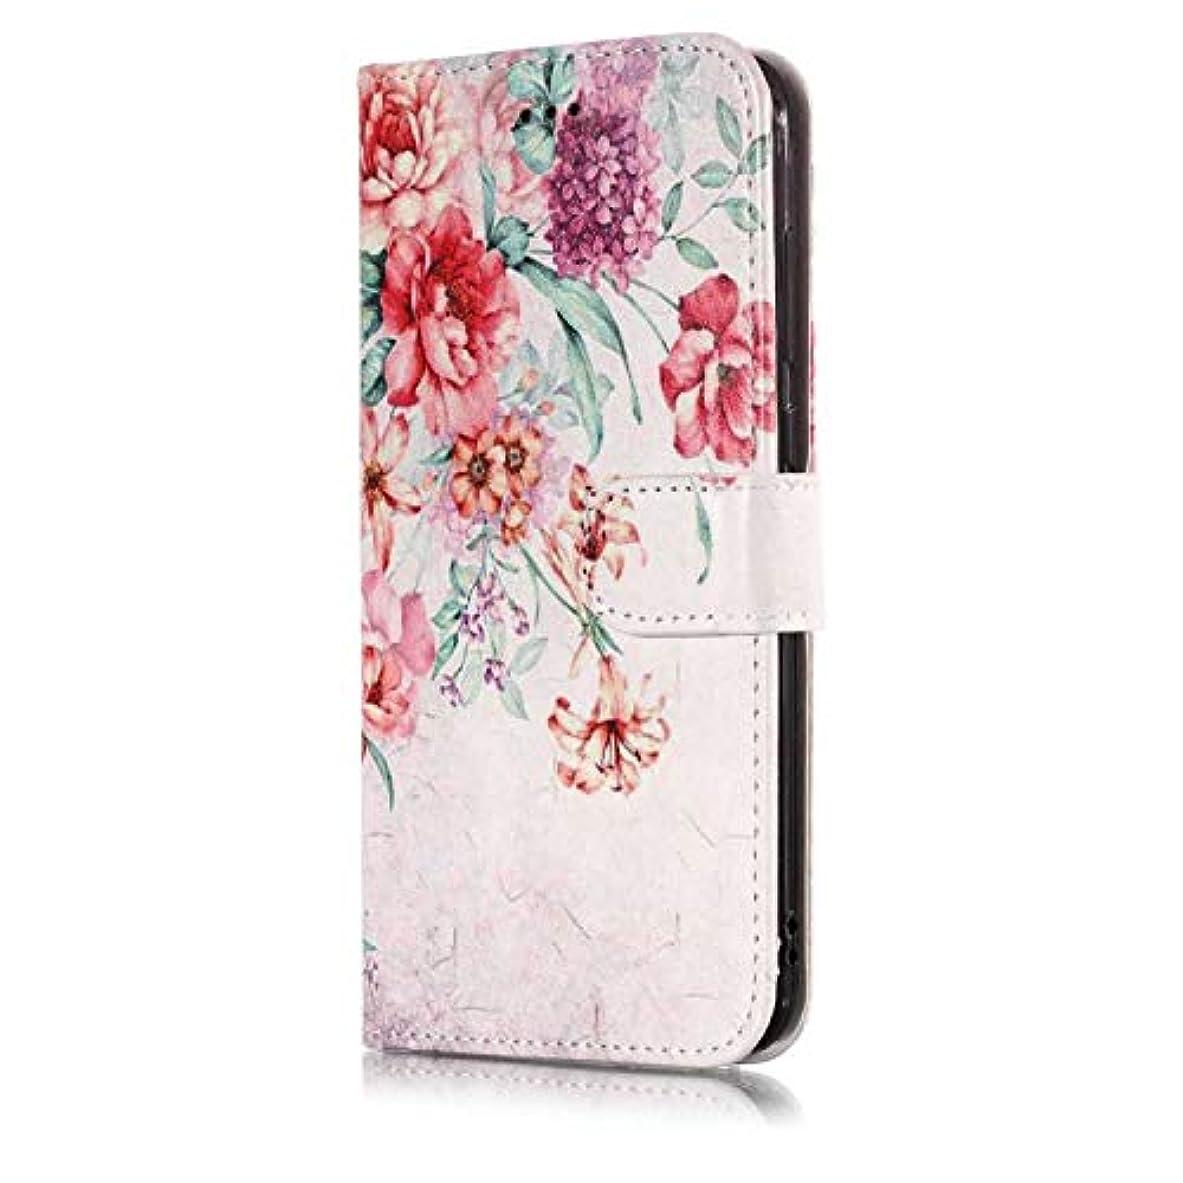 CUSKING Huawei P8 Lite 2017 手帳型ケース Huawei P8 Lite 2017 手帳型 カバー 札入れフ カードポケット スタント機能 横開き 磁気バックル ケース - 柄4